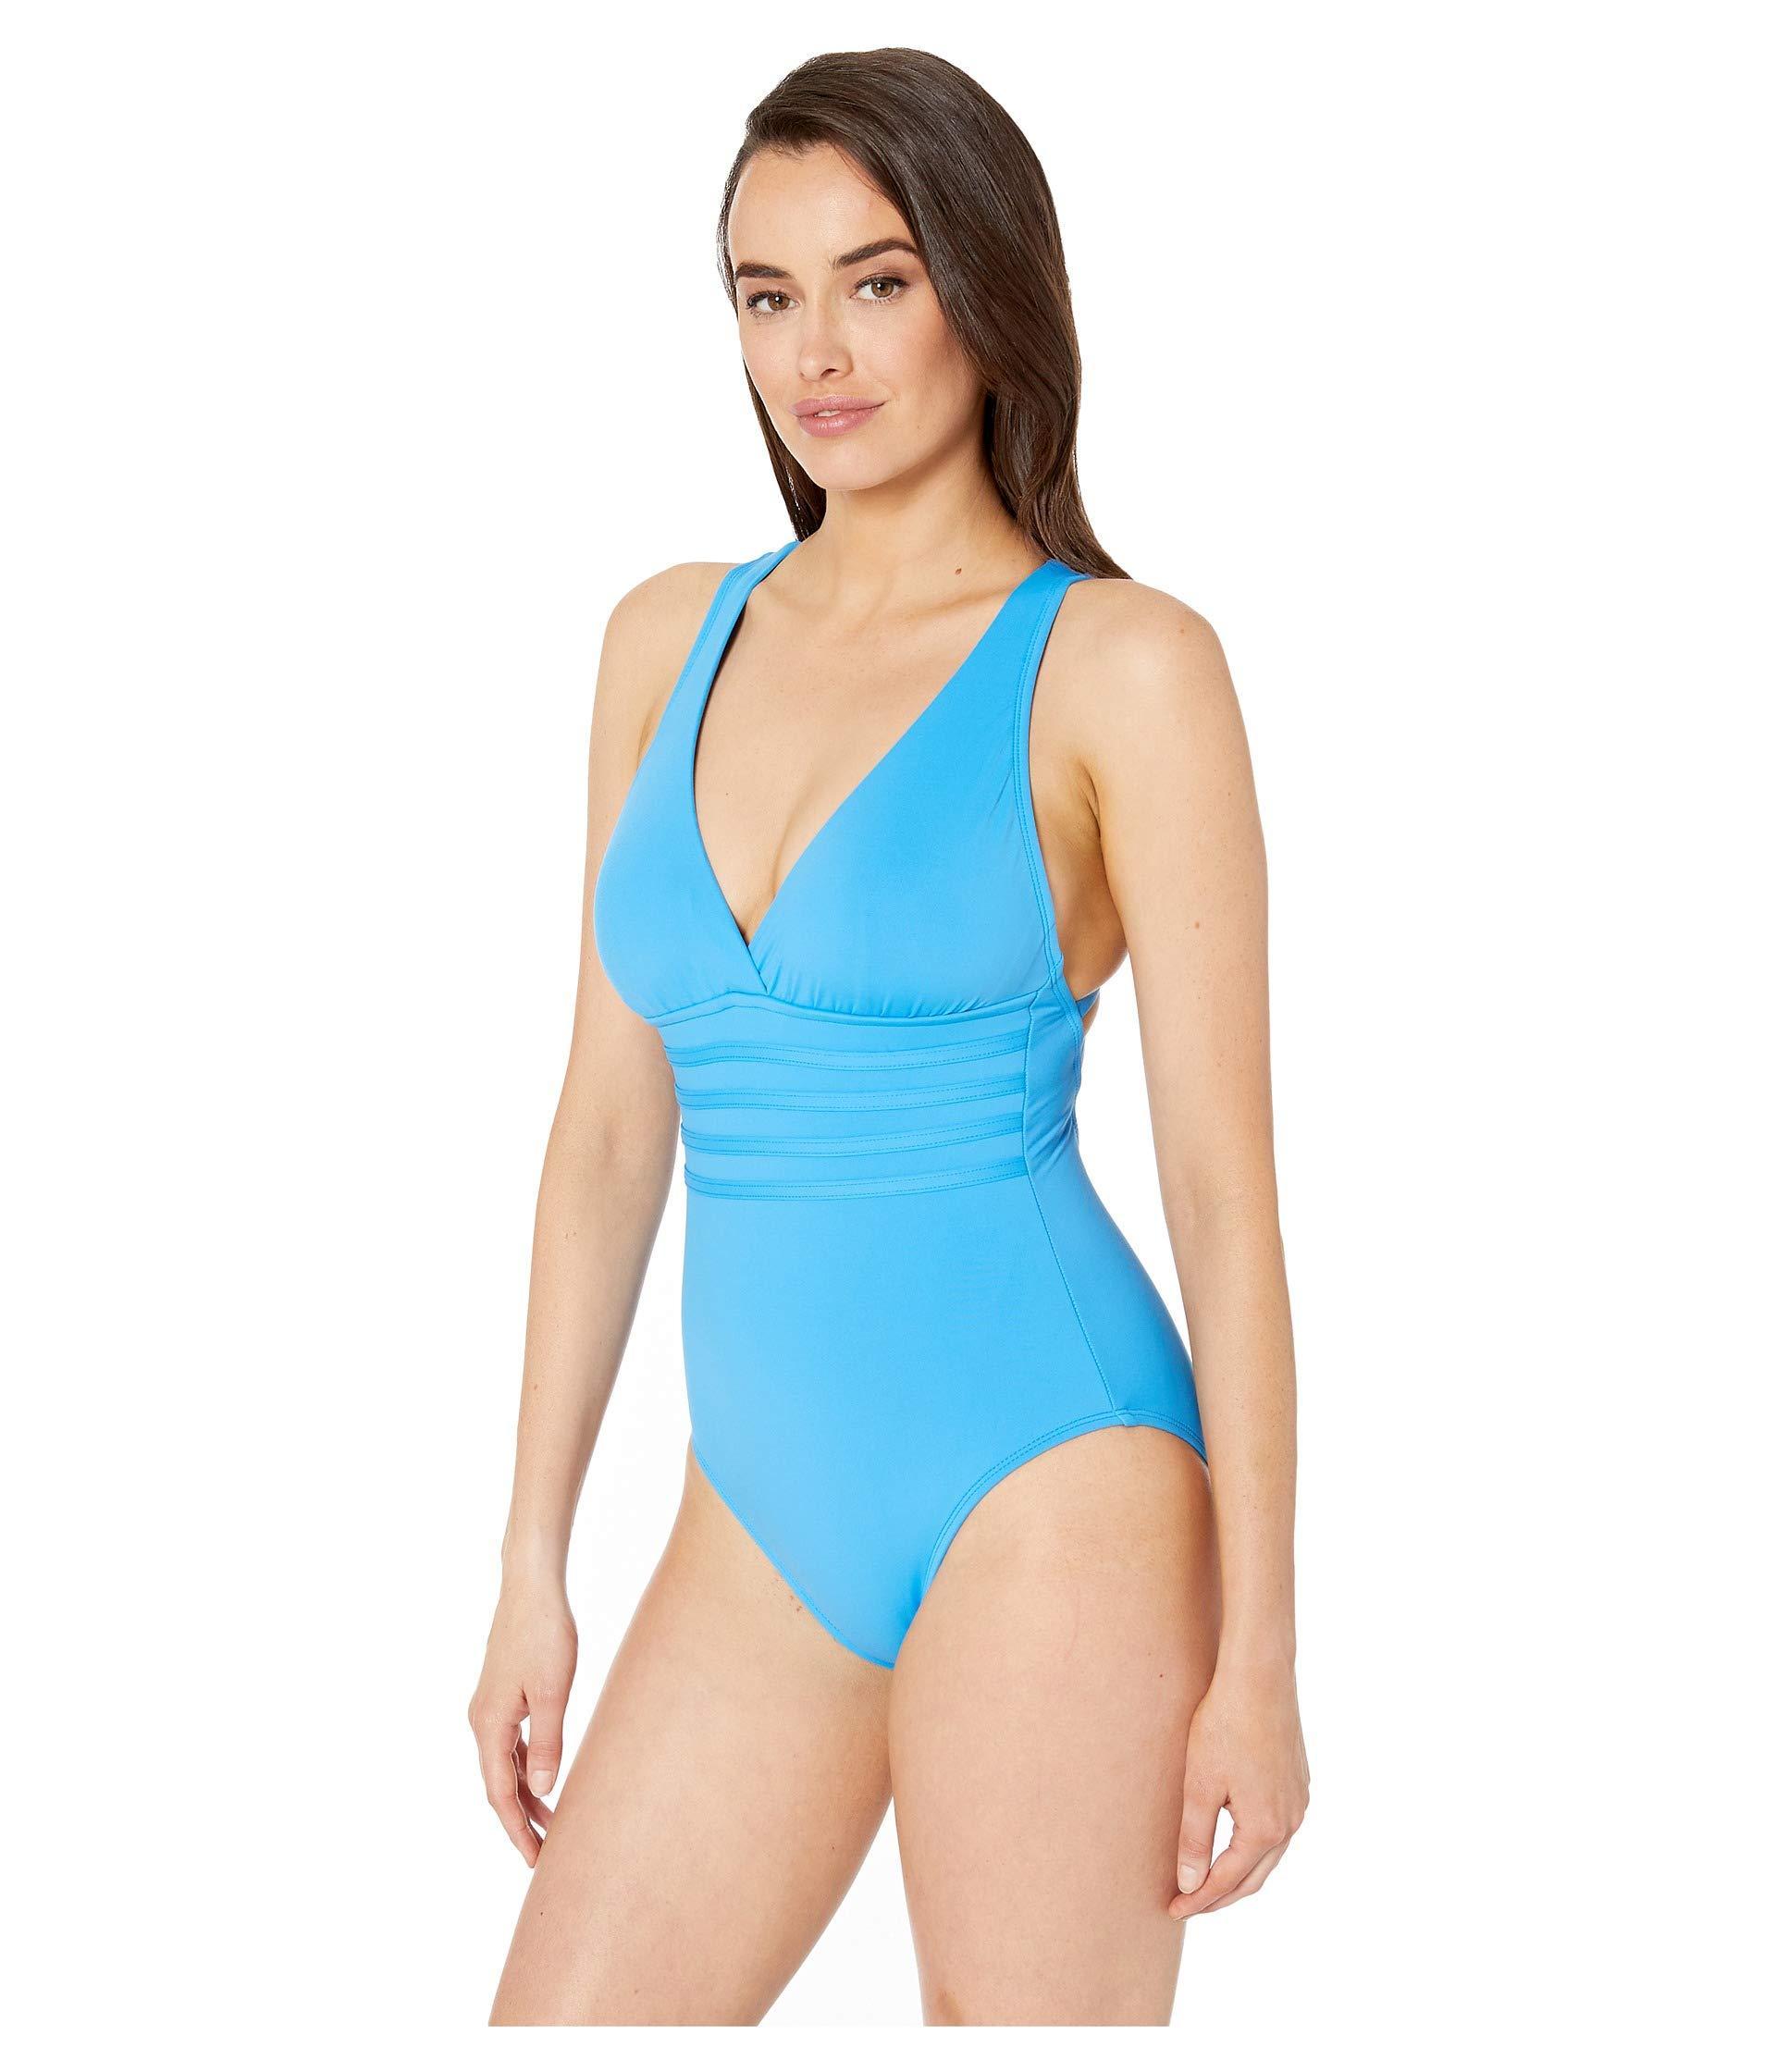 d0a8f392d1 Lyst - La Blanca Island Goddess Multi Strap Cross-back Mio One-piece  (chambray) Women's Swimsuits One Piece in Blue